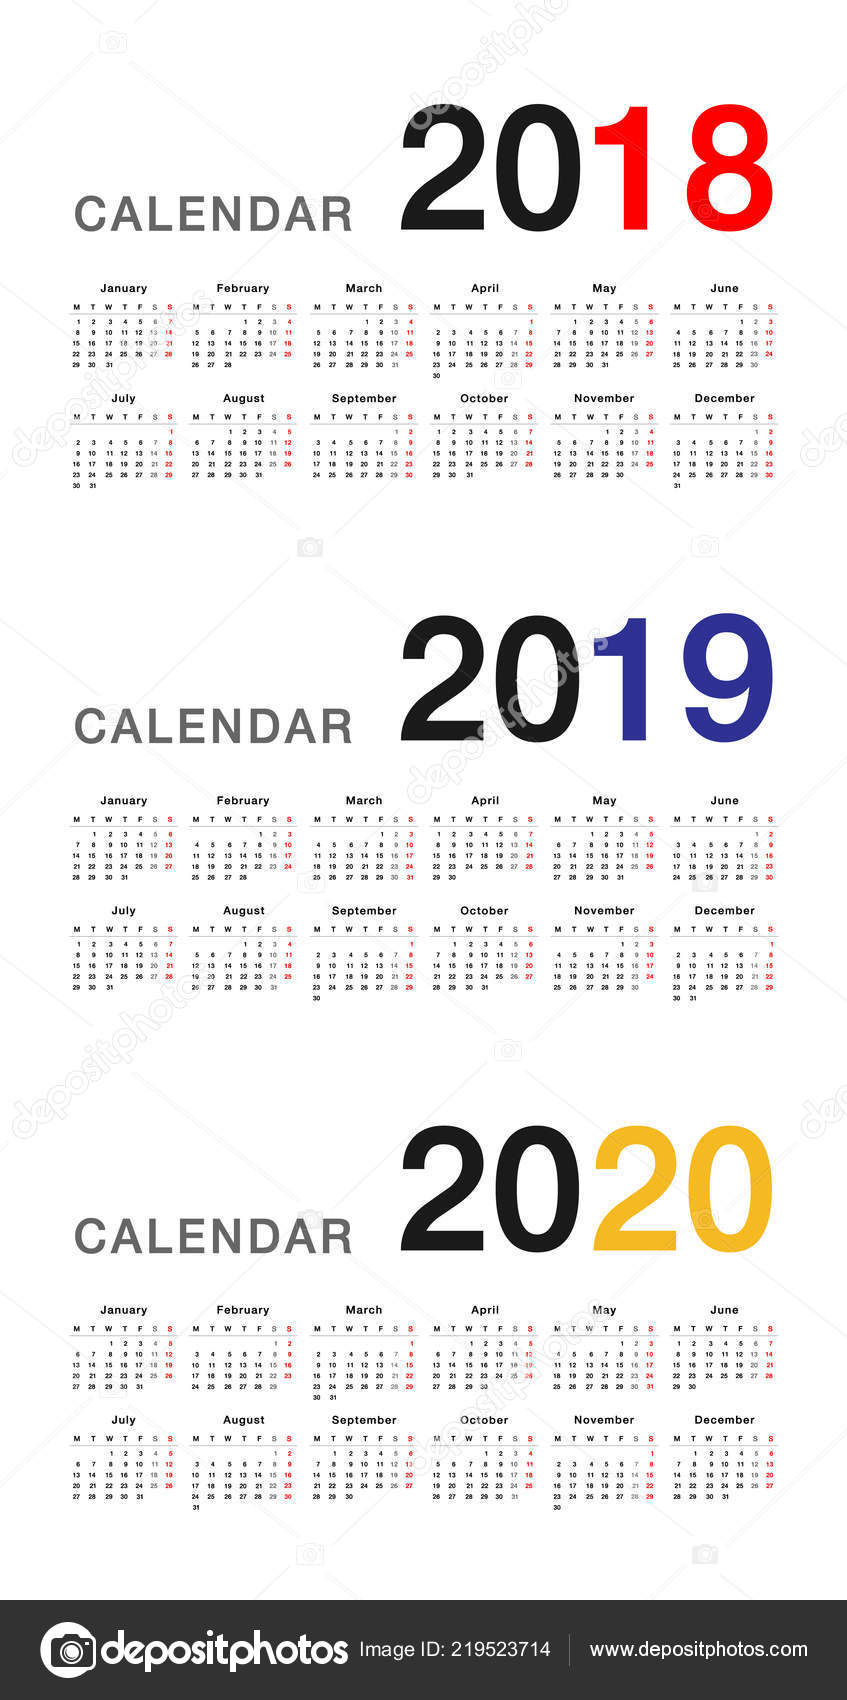 Calendar Year 2020.Year 2018 Year 2019 Year 2020 Calendar Vector Design Template